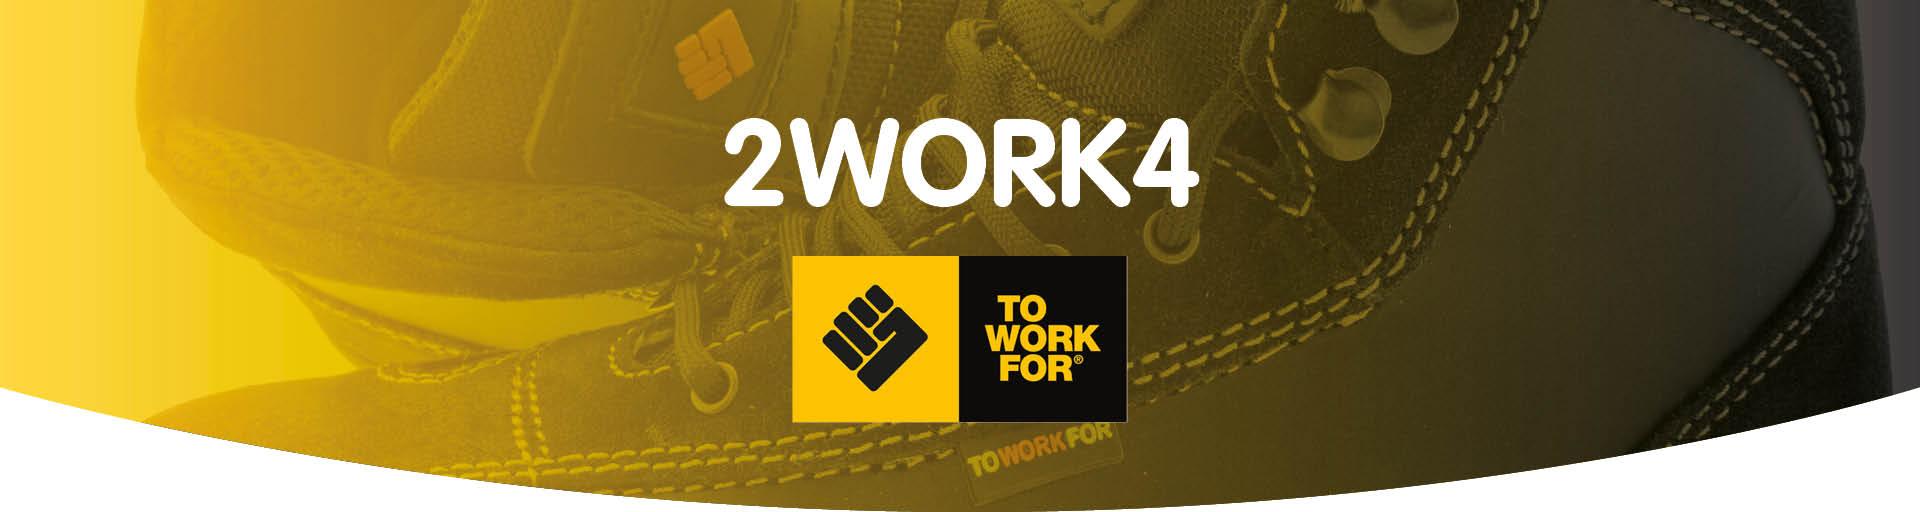 2work4